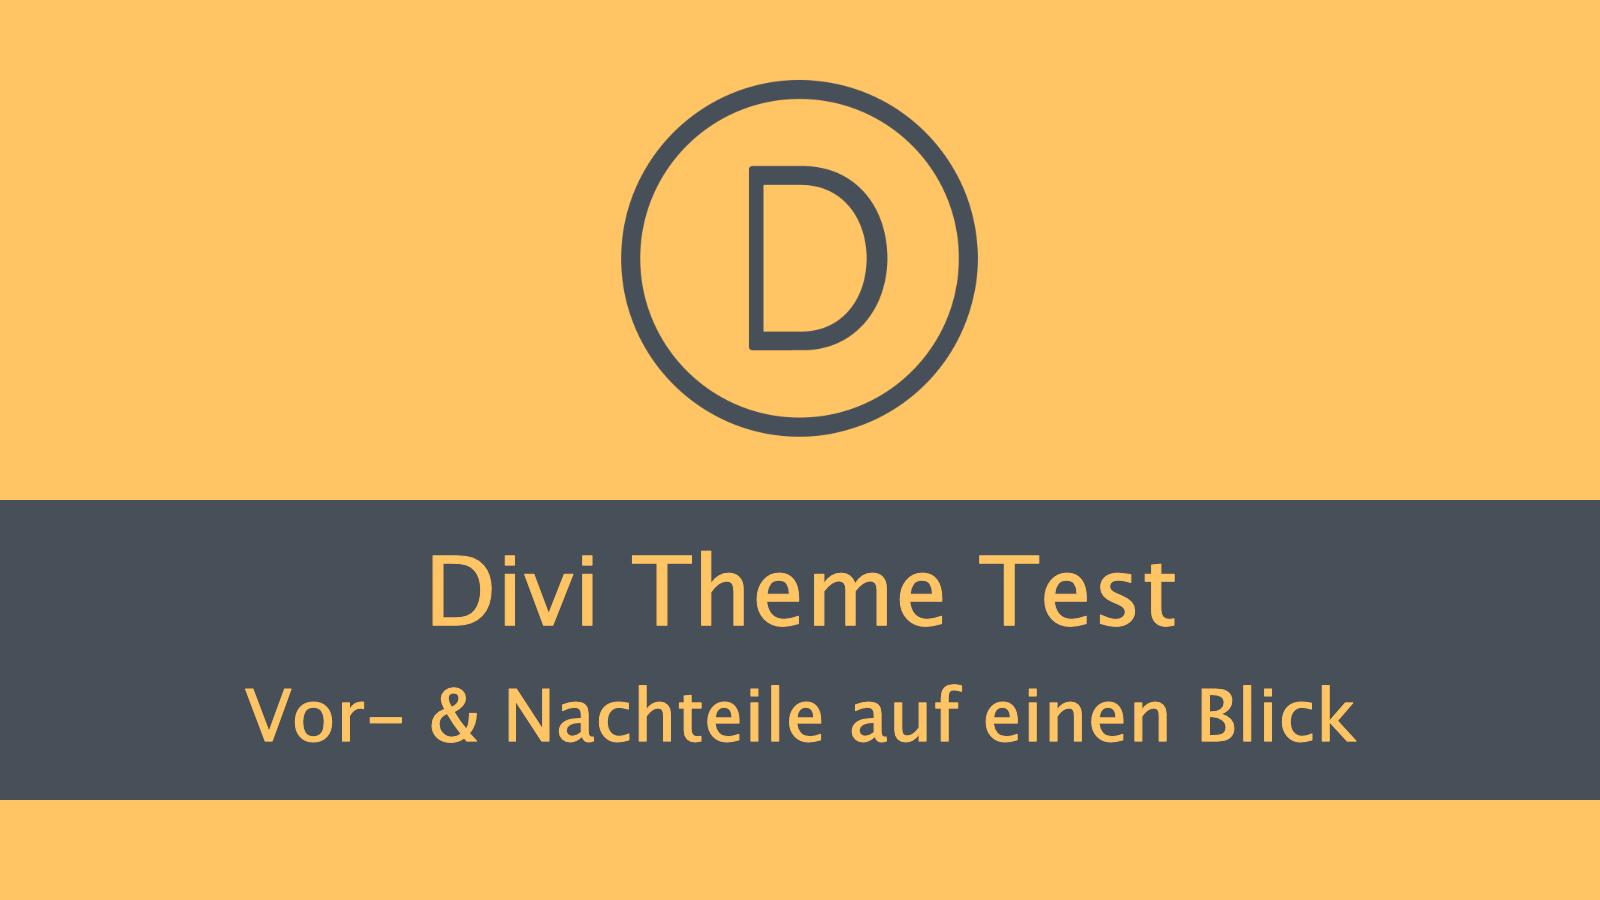 Divi Theme Test